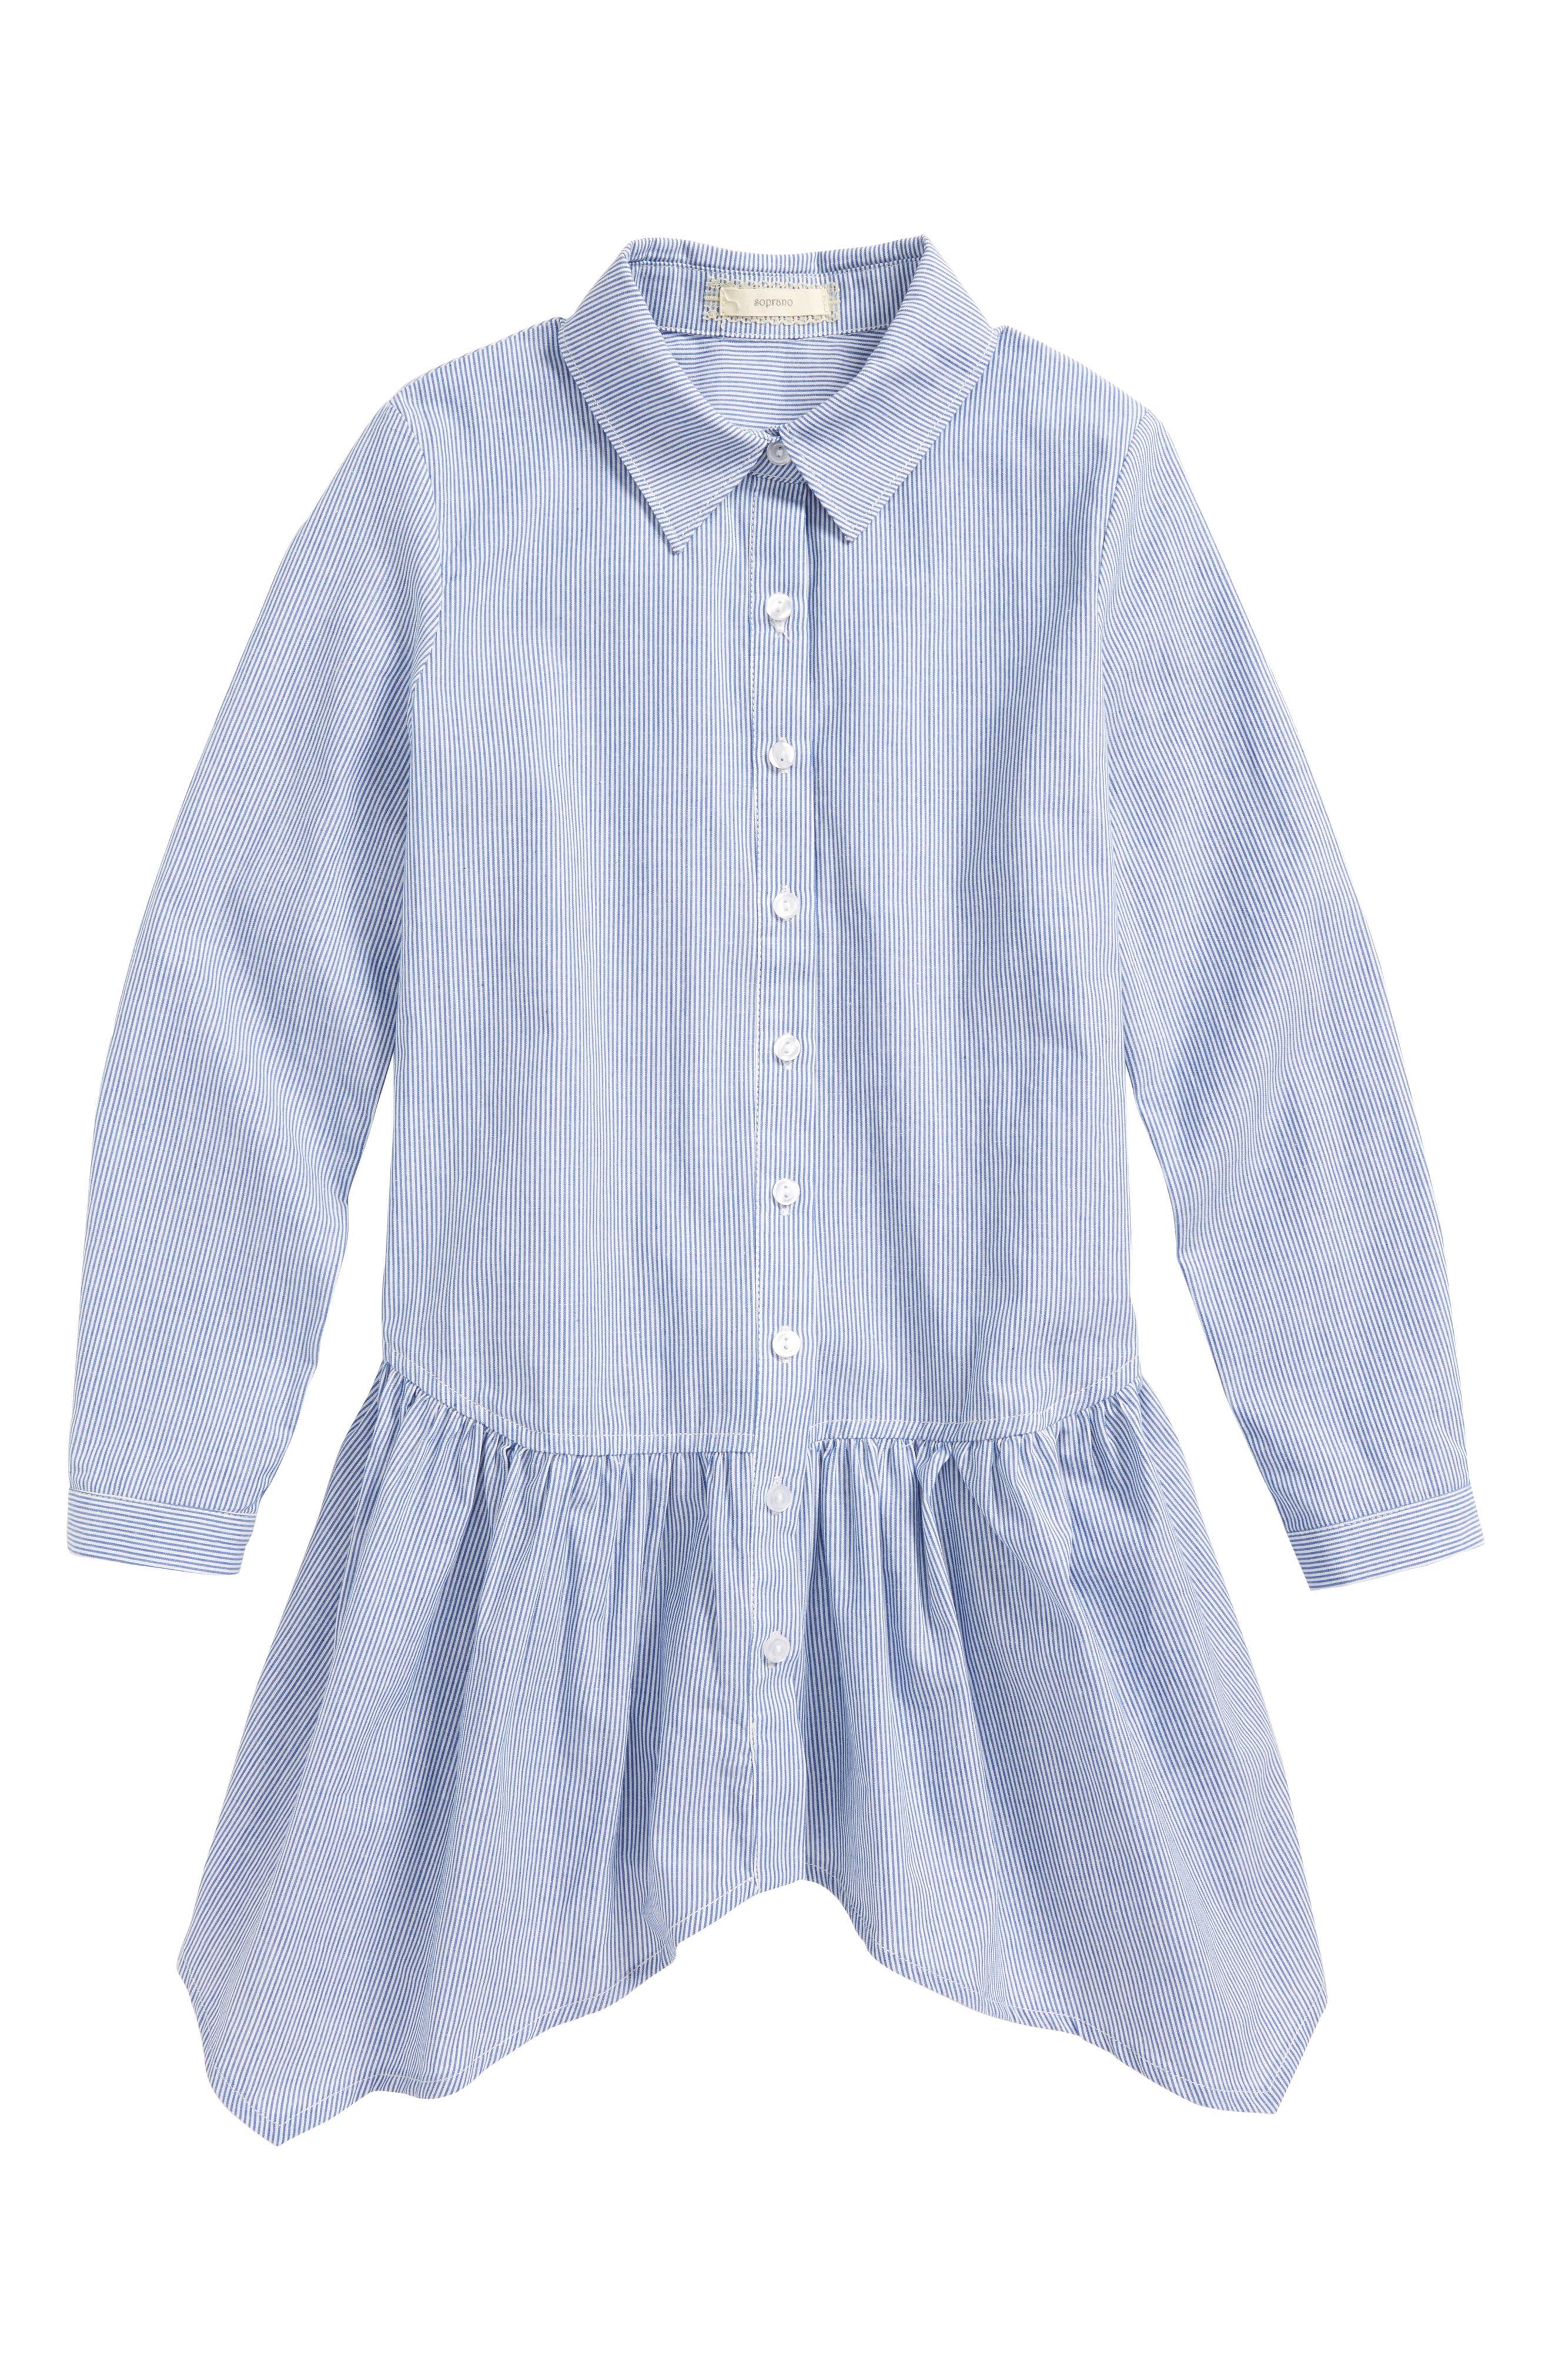 Stripe Peplum Shirt,                             Main thumbnail 1, color,                             401